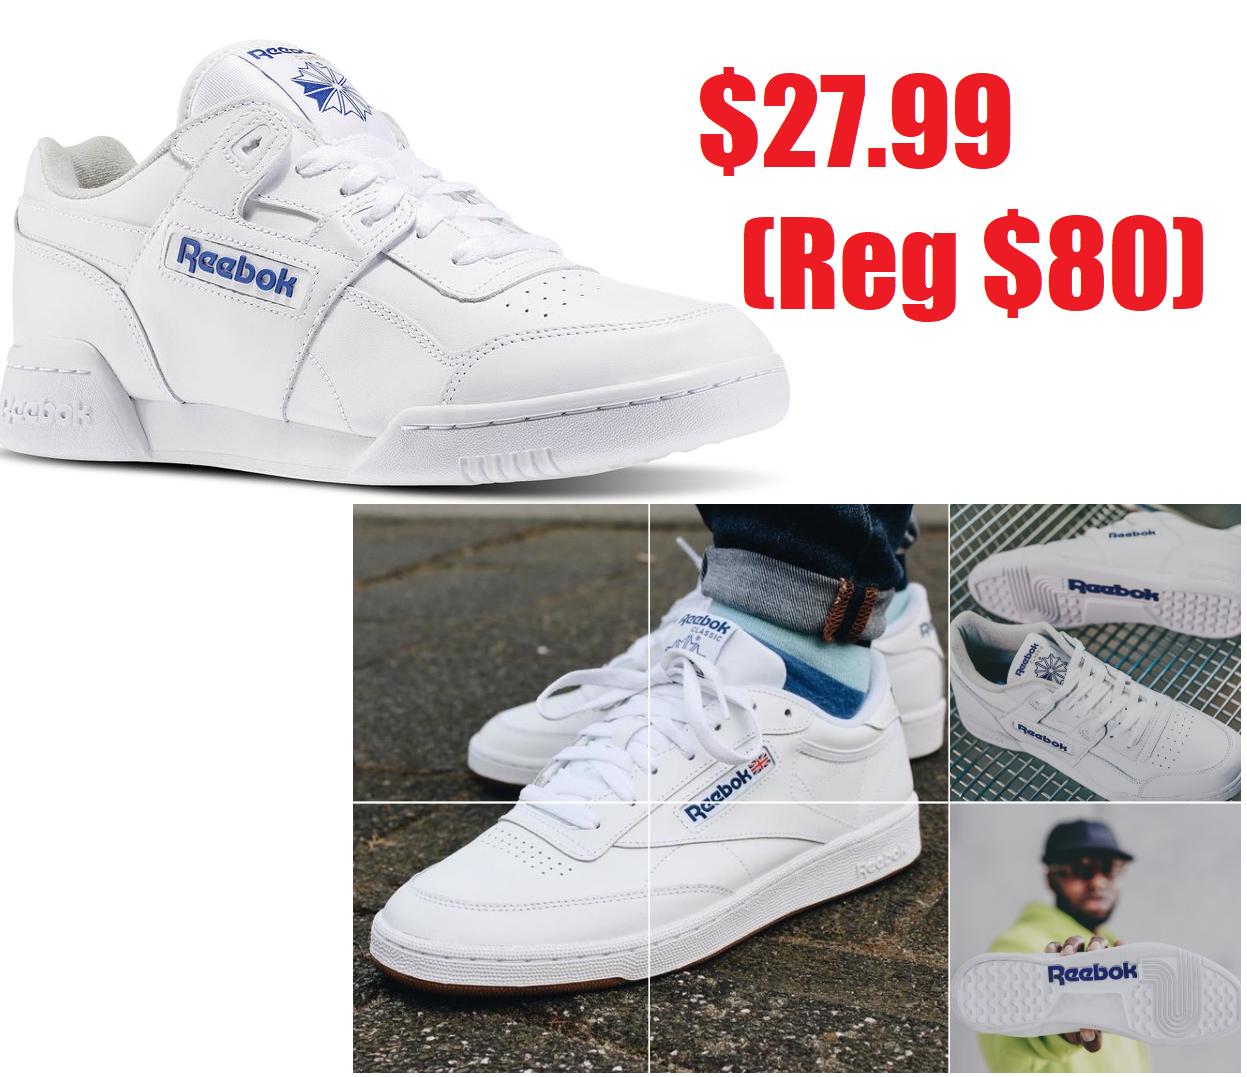 b35b5da8e61d3f Reebok Classics White Leather Workout Plus  27.99 + Free Shipping   Free  Returns